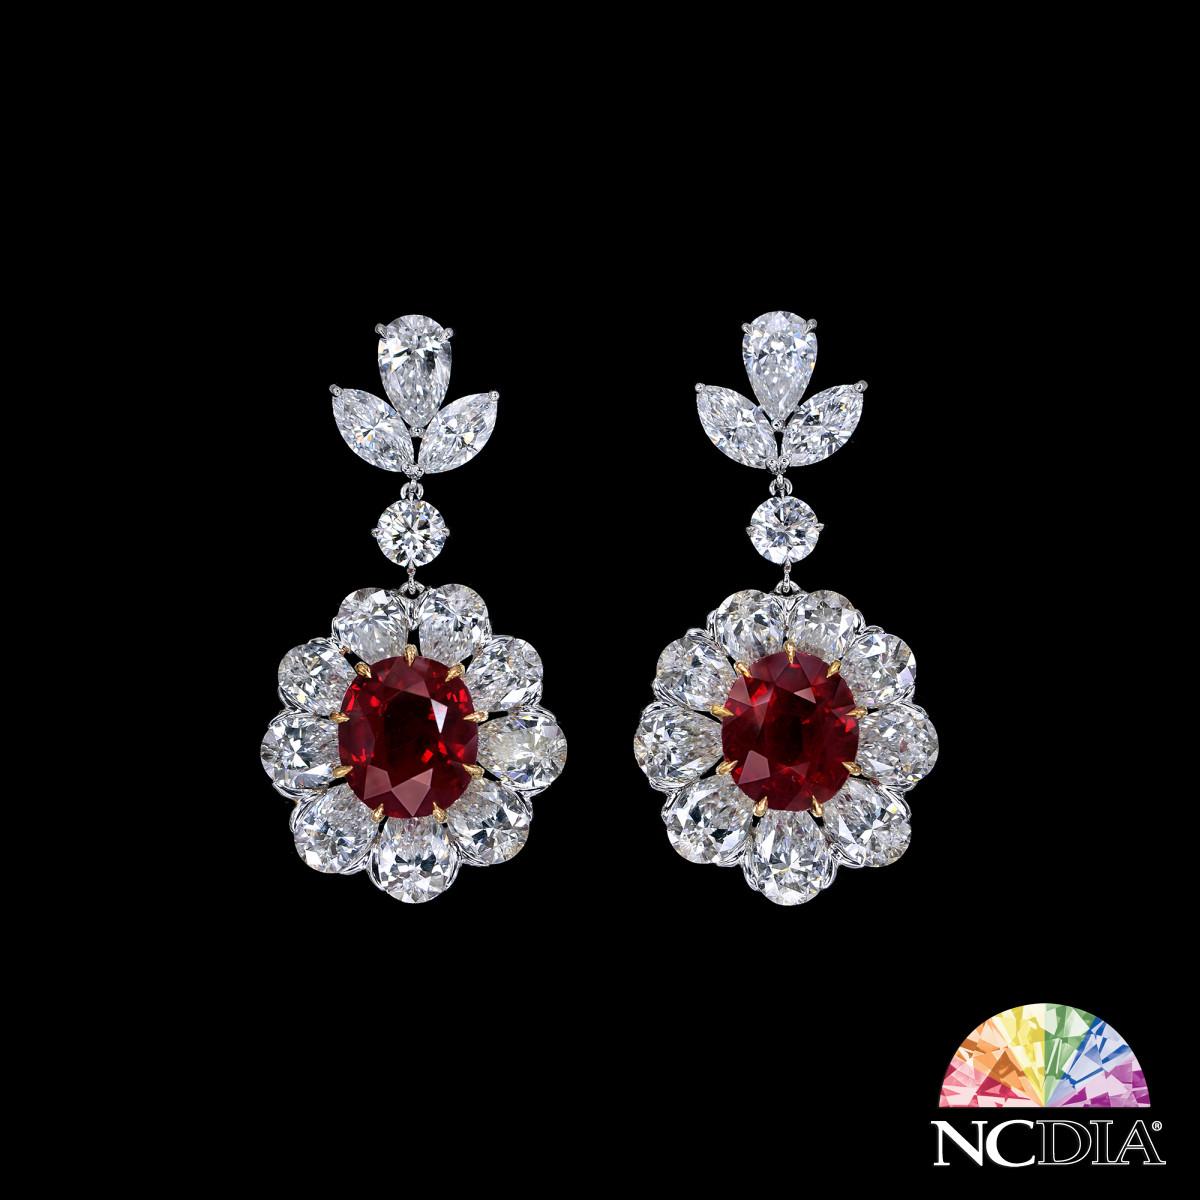 Over 6 cts ea Oval Shape Pigeon Blood Burmese Ruby Diamond Earrings, GRS & GUB certs ava.